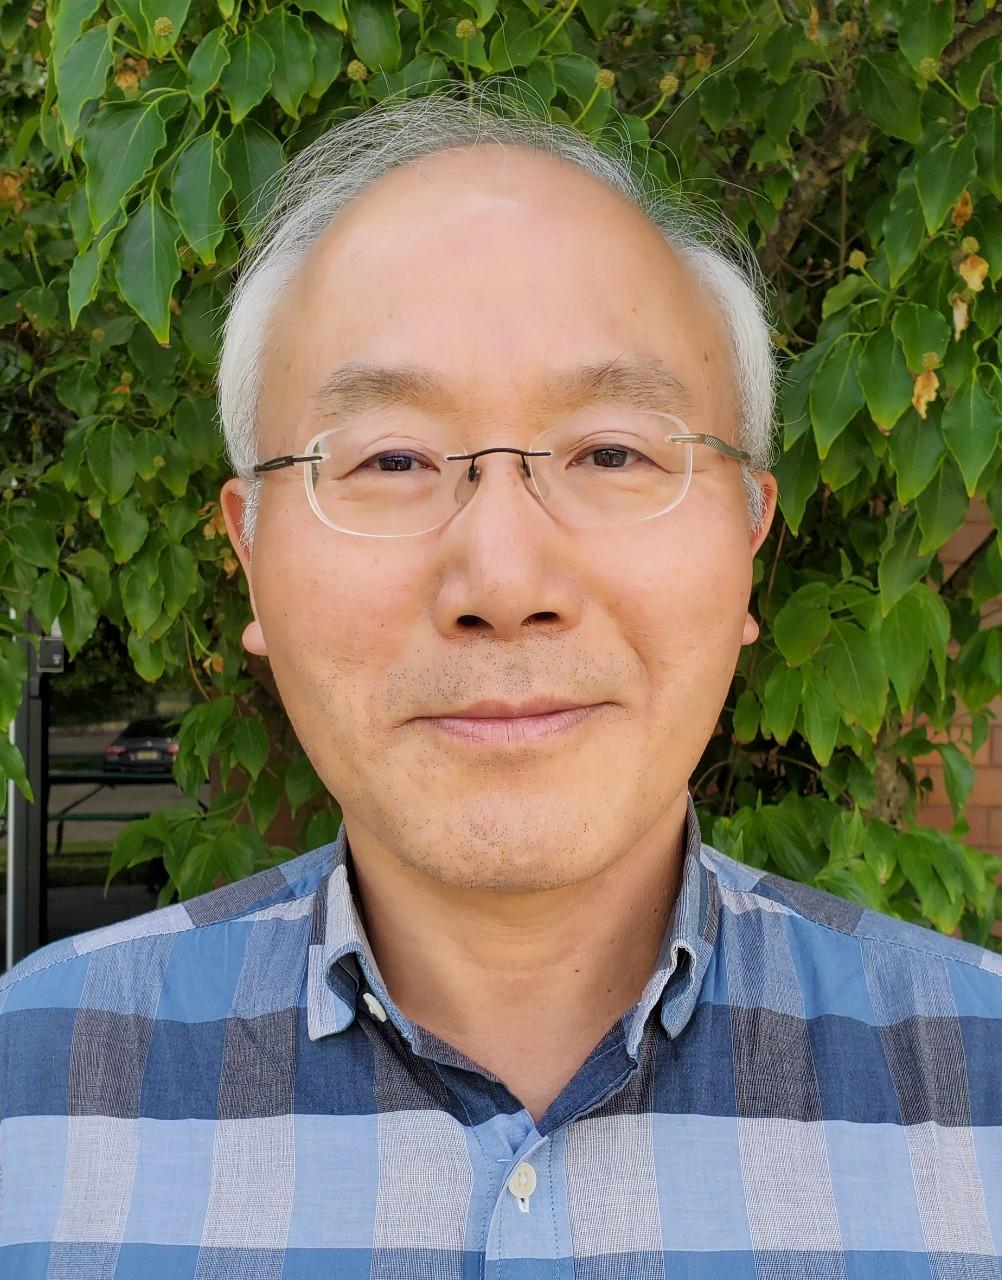 Dochul Choi, Ph.D, Samsung